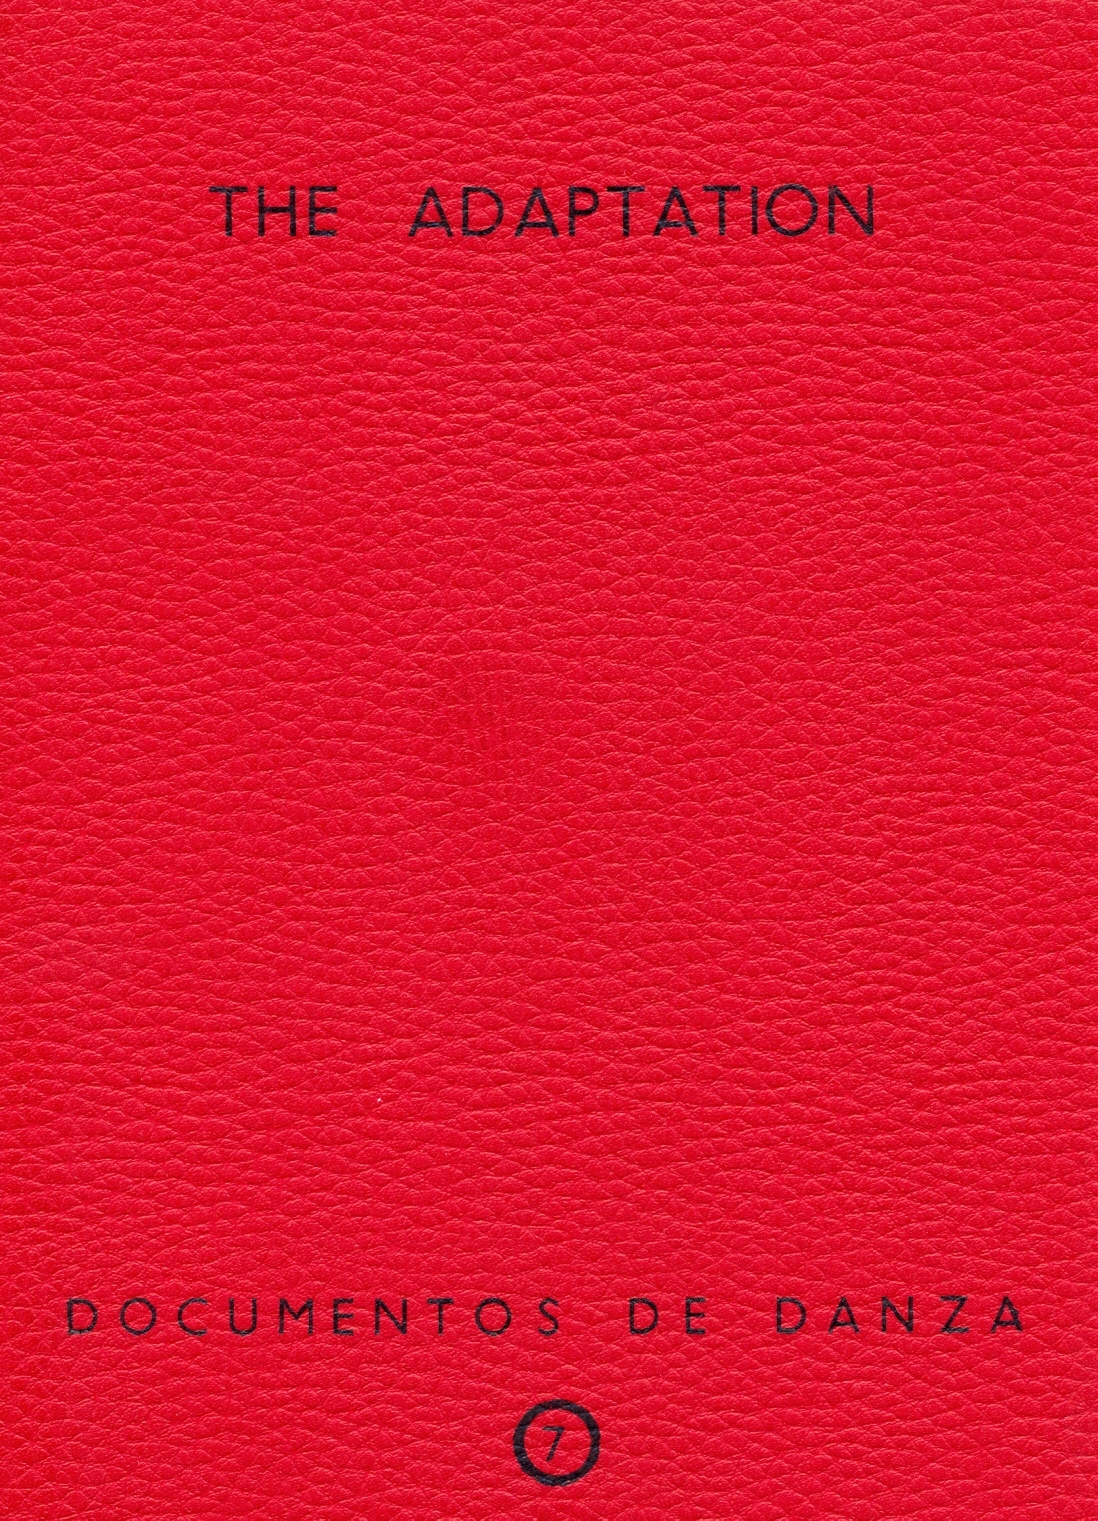 THE ADAPTATION